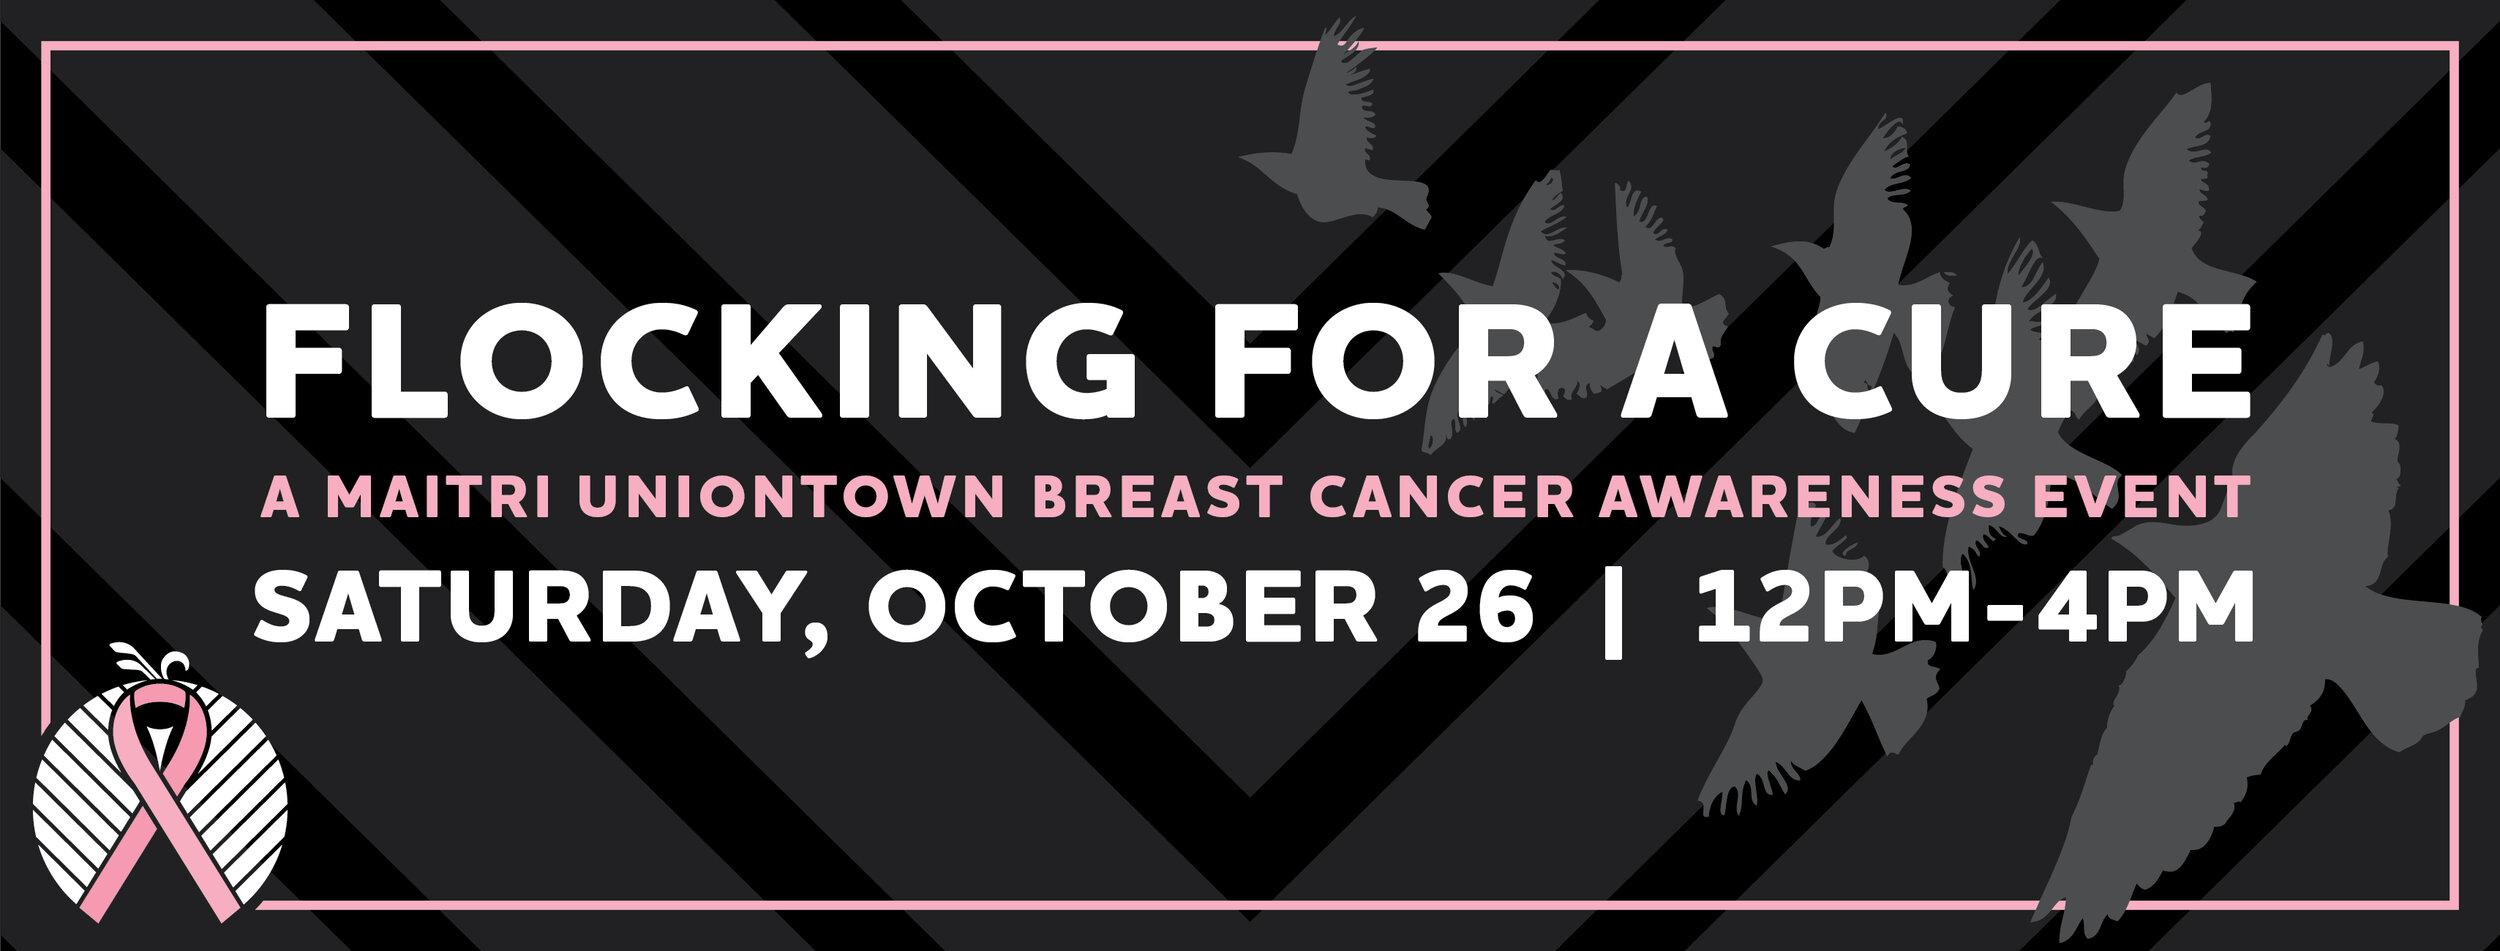 Maitri_Breast Cancer Awareness-Facebook Header.jpg